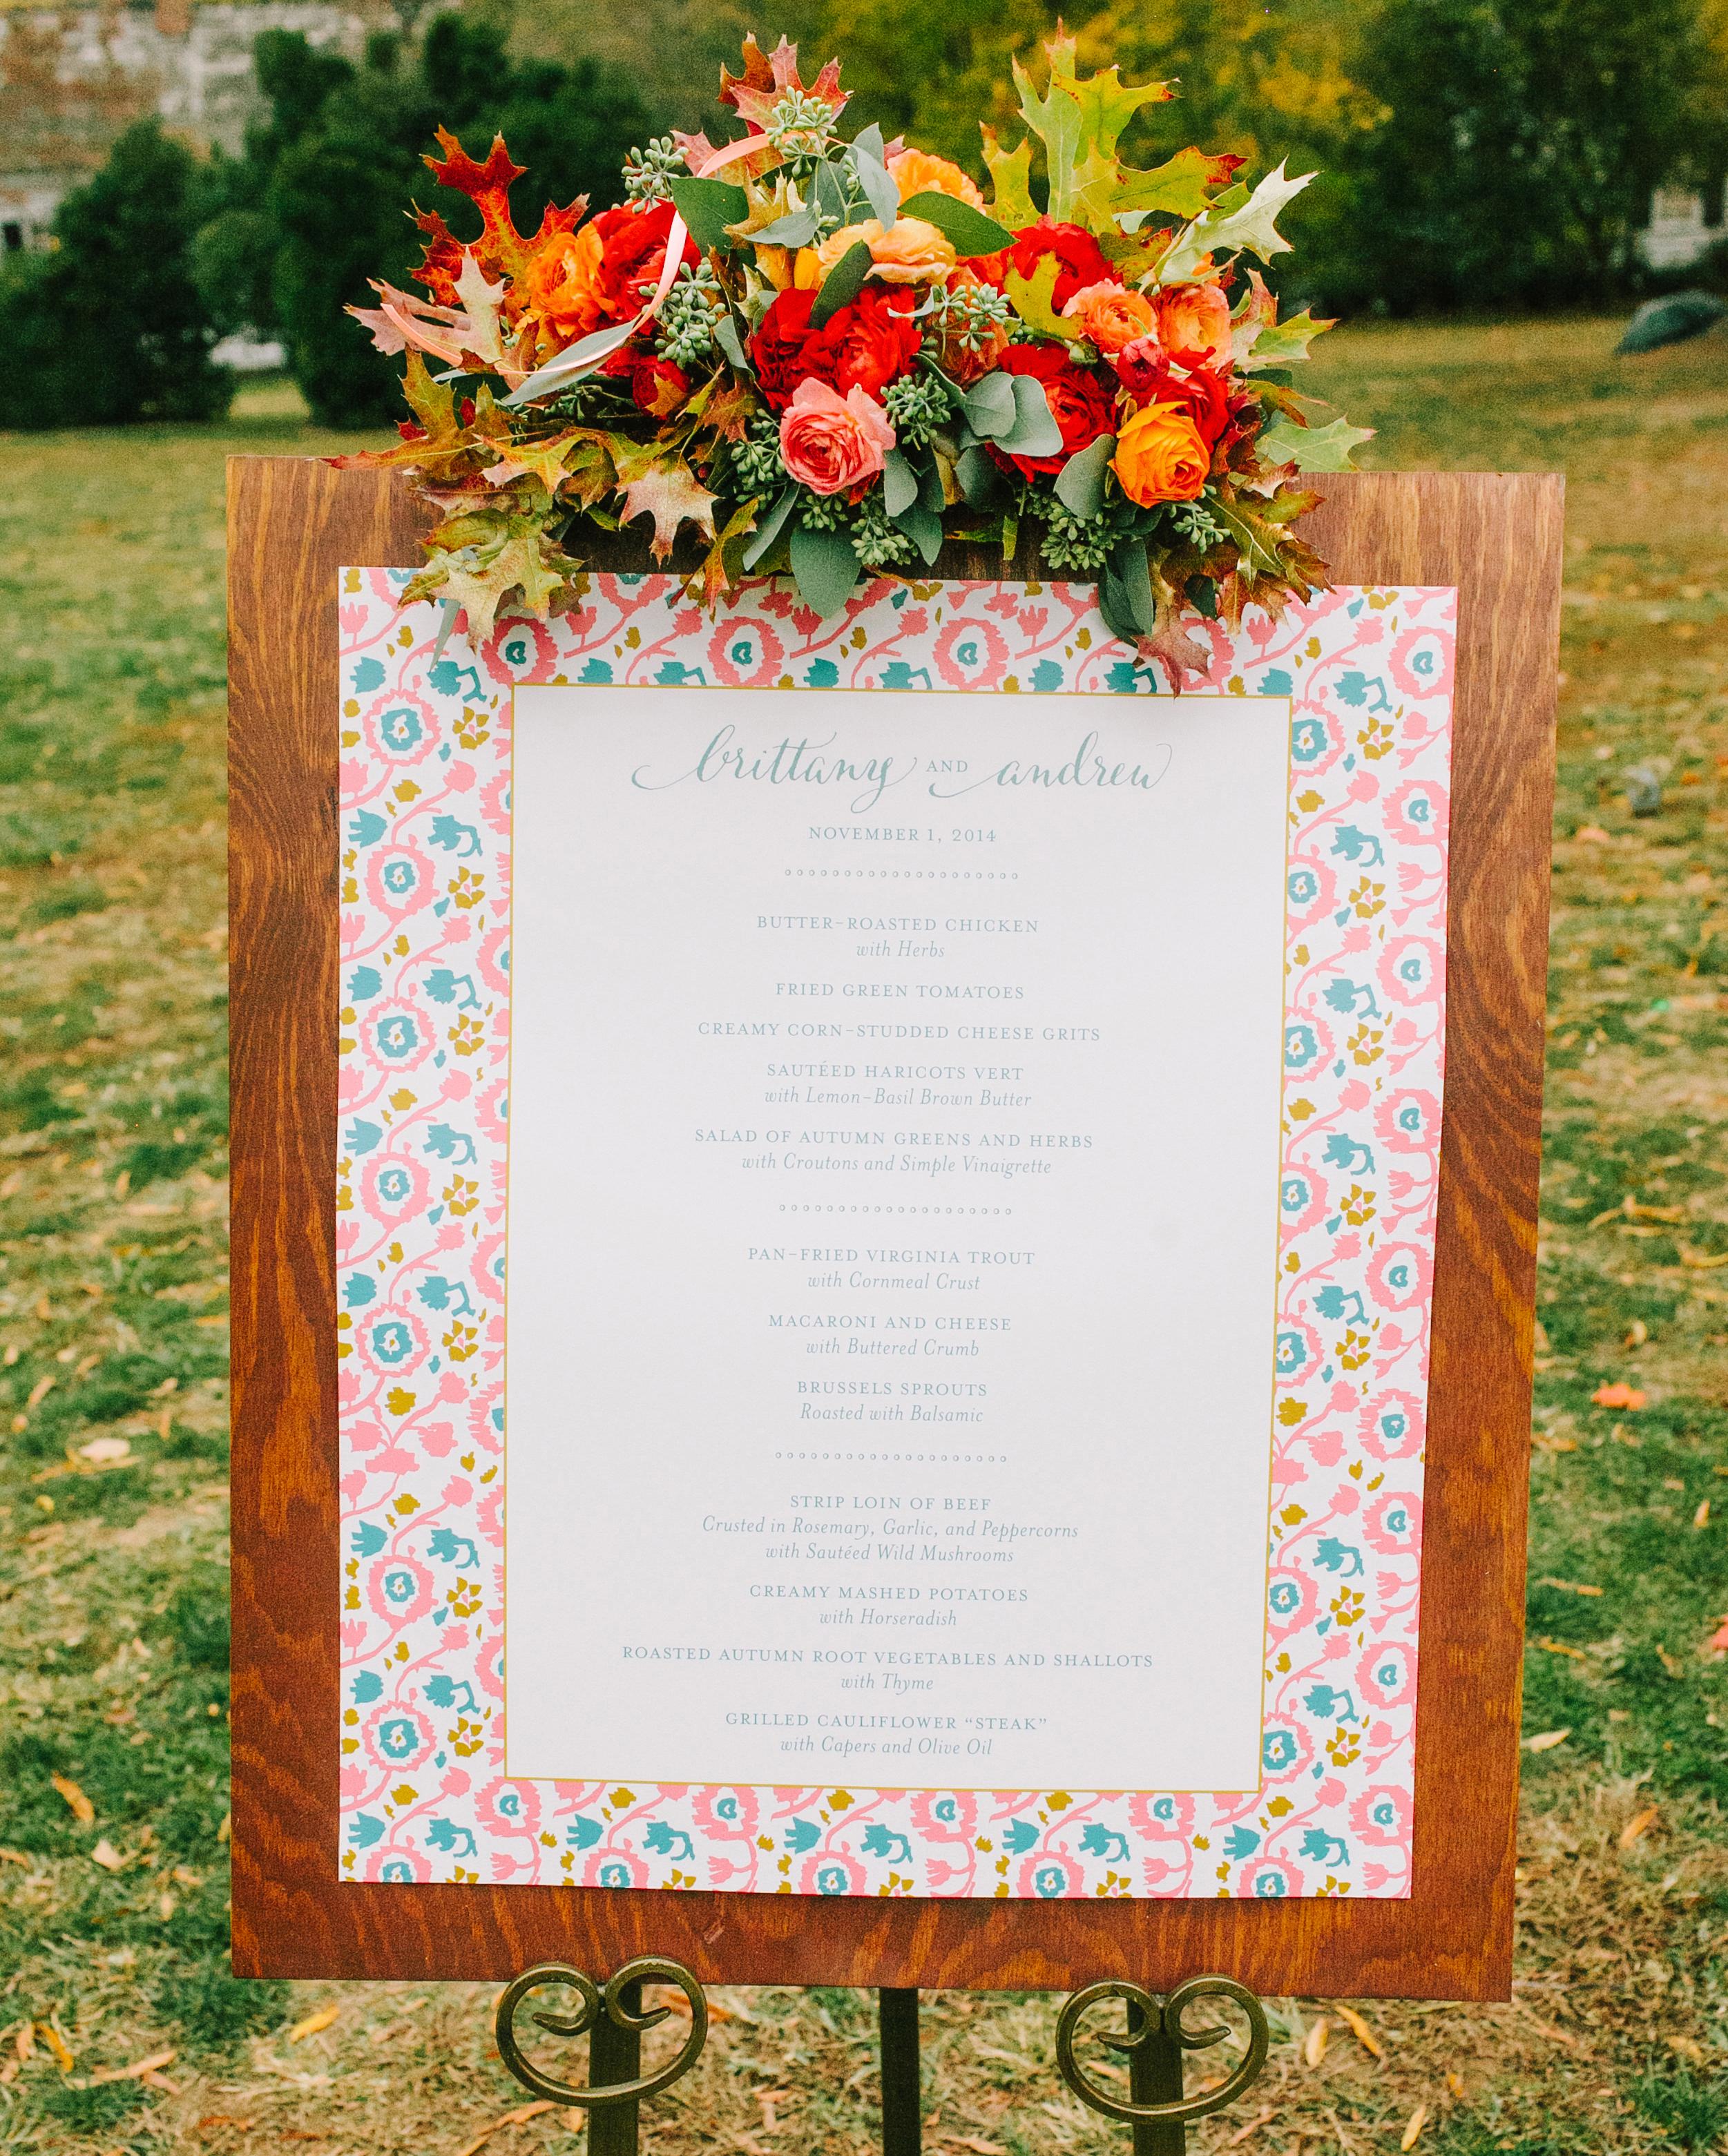 brittany-andrew-wedding-menu-074-s112067-0715.jpg